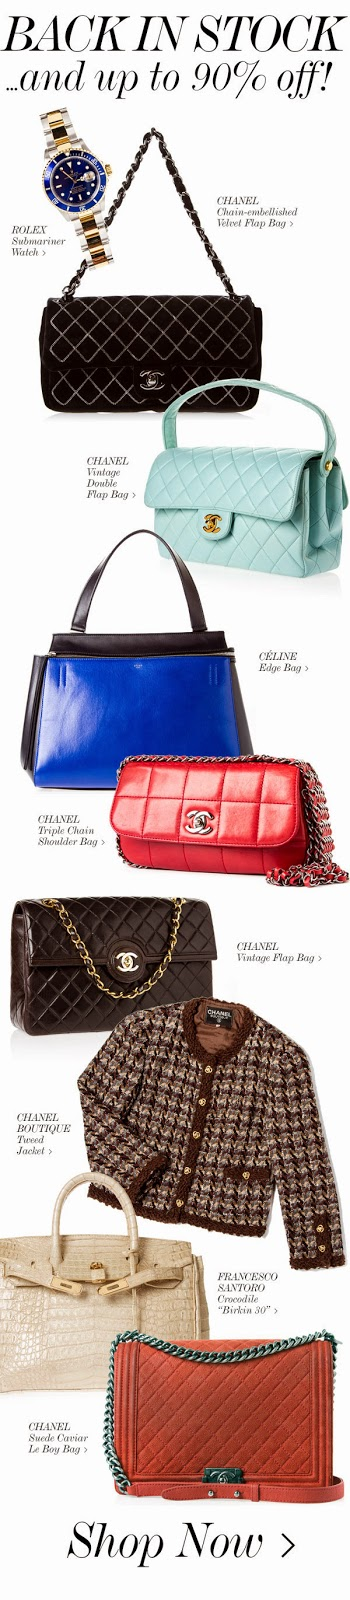 luxury designer consignment shop vancouver luxury resale online